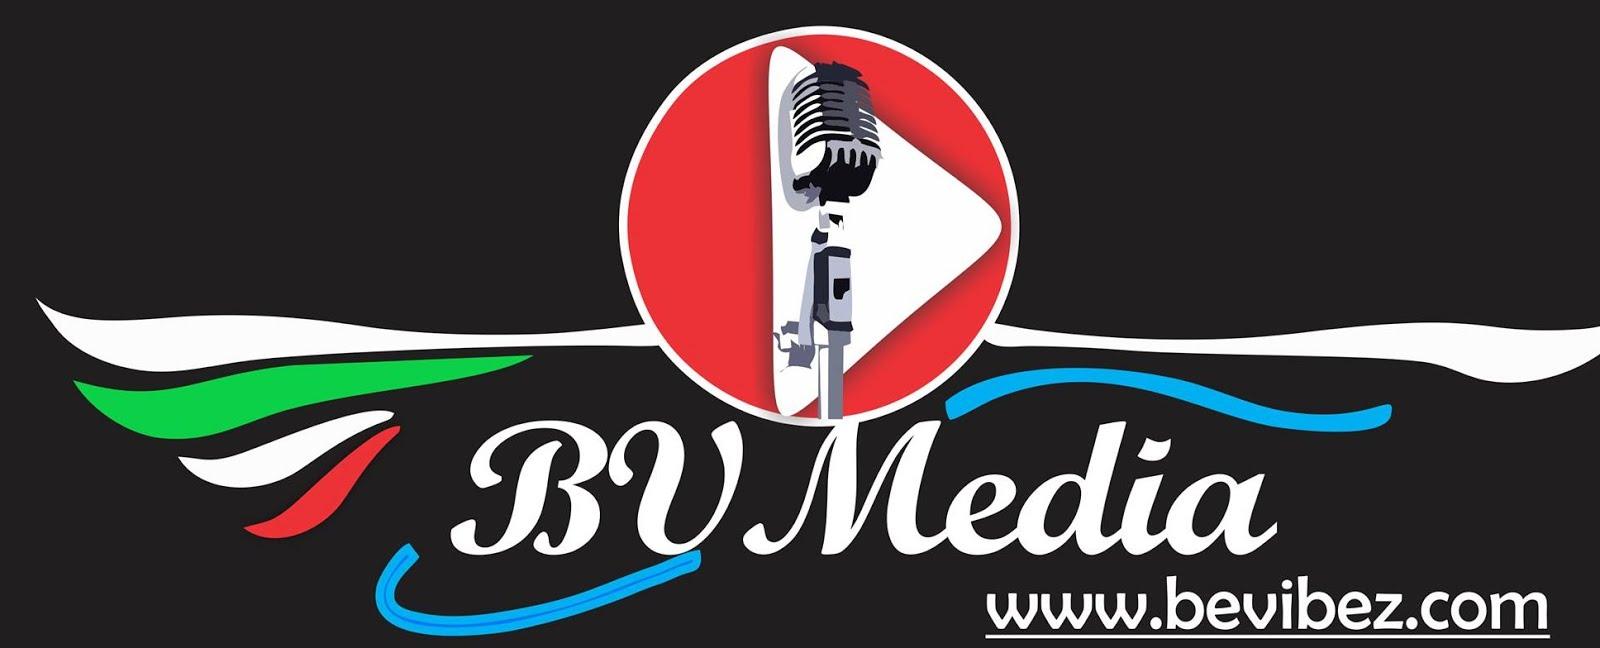 BeVibez Media